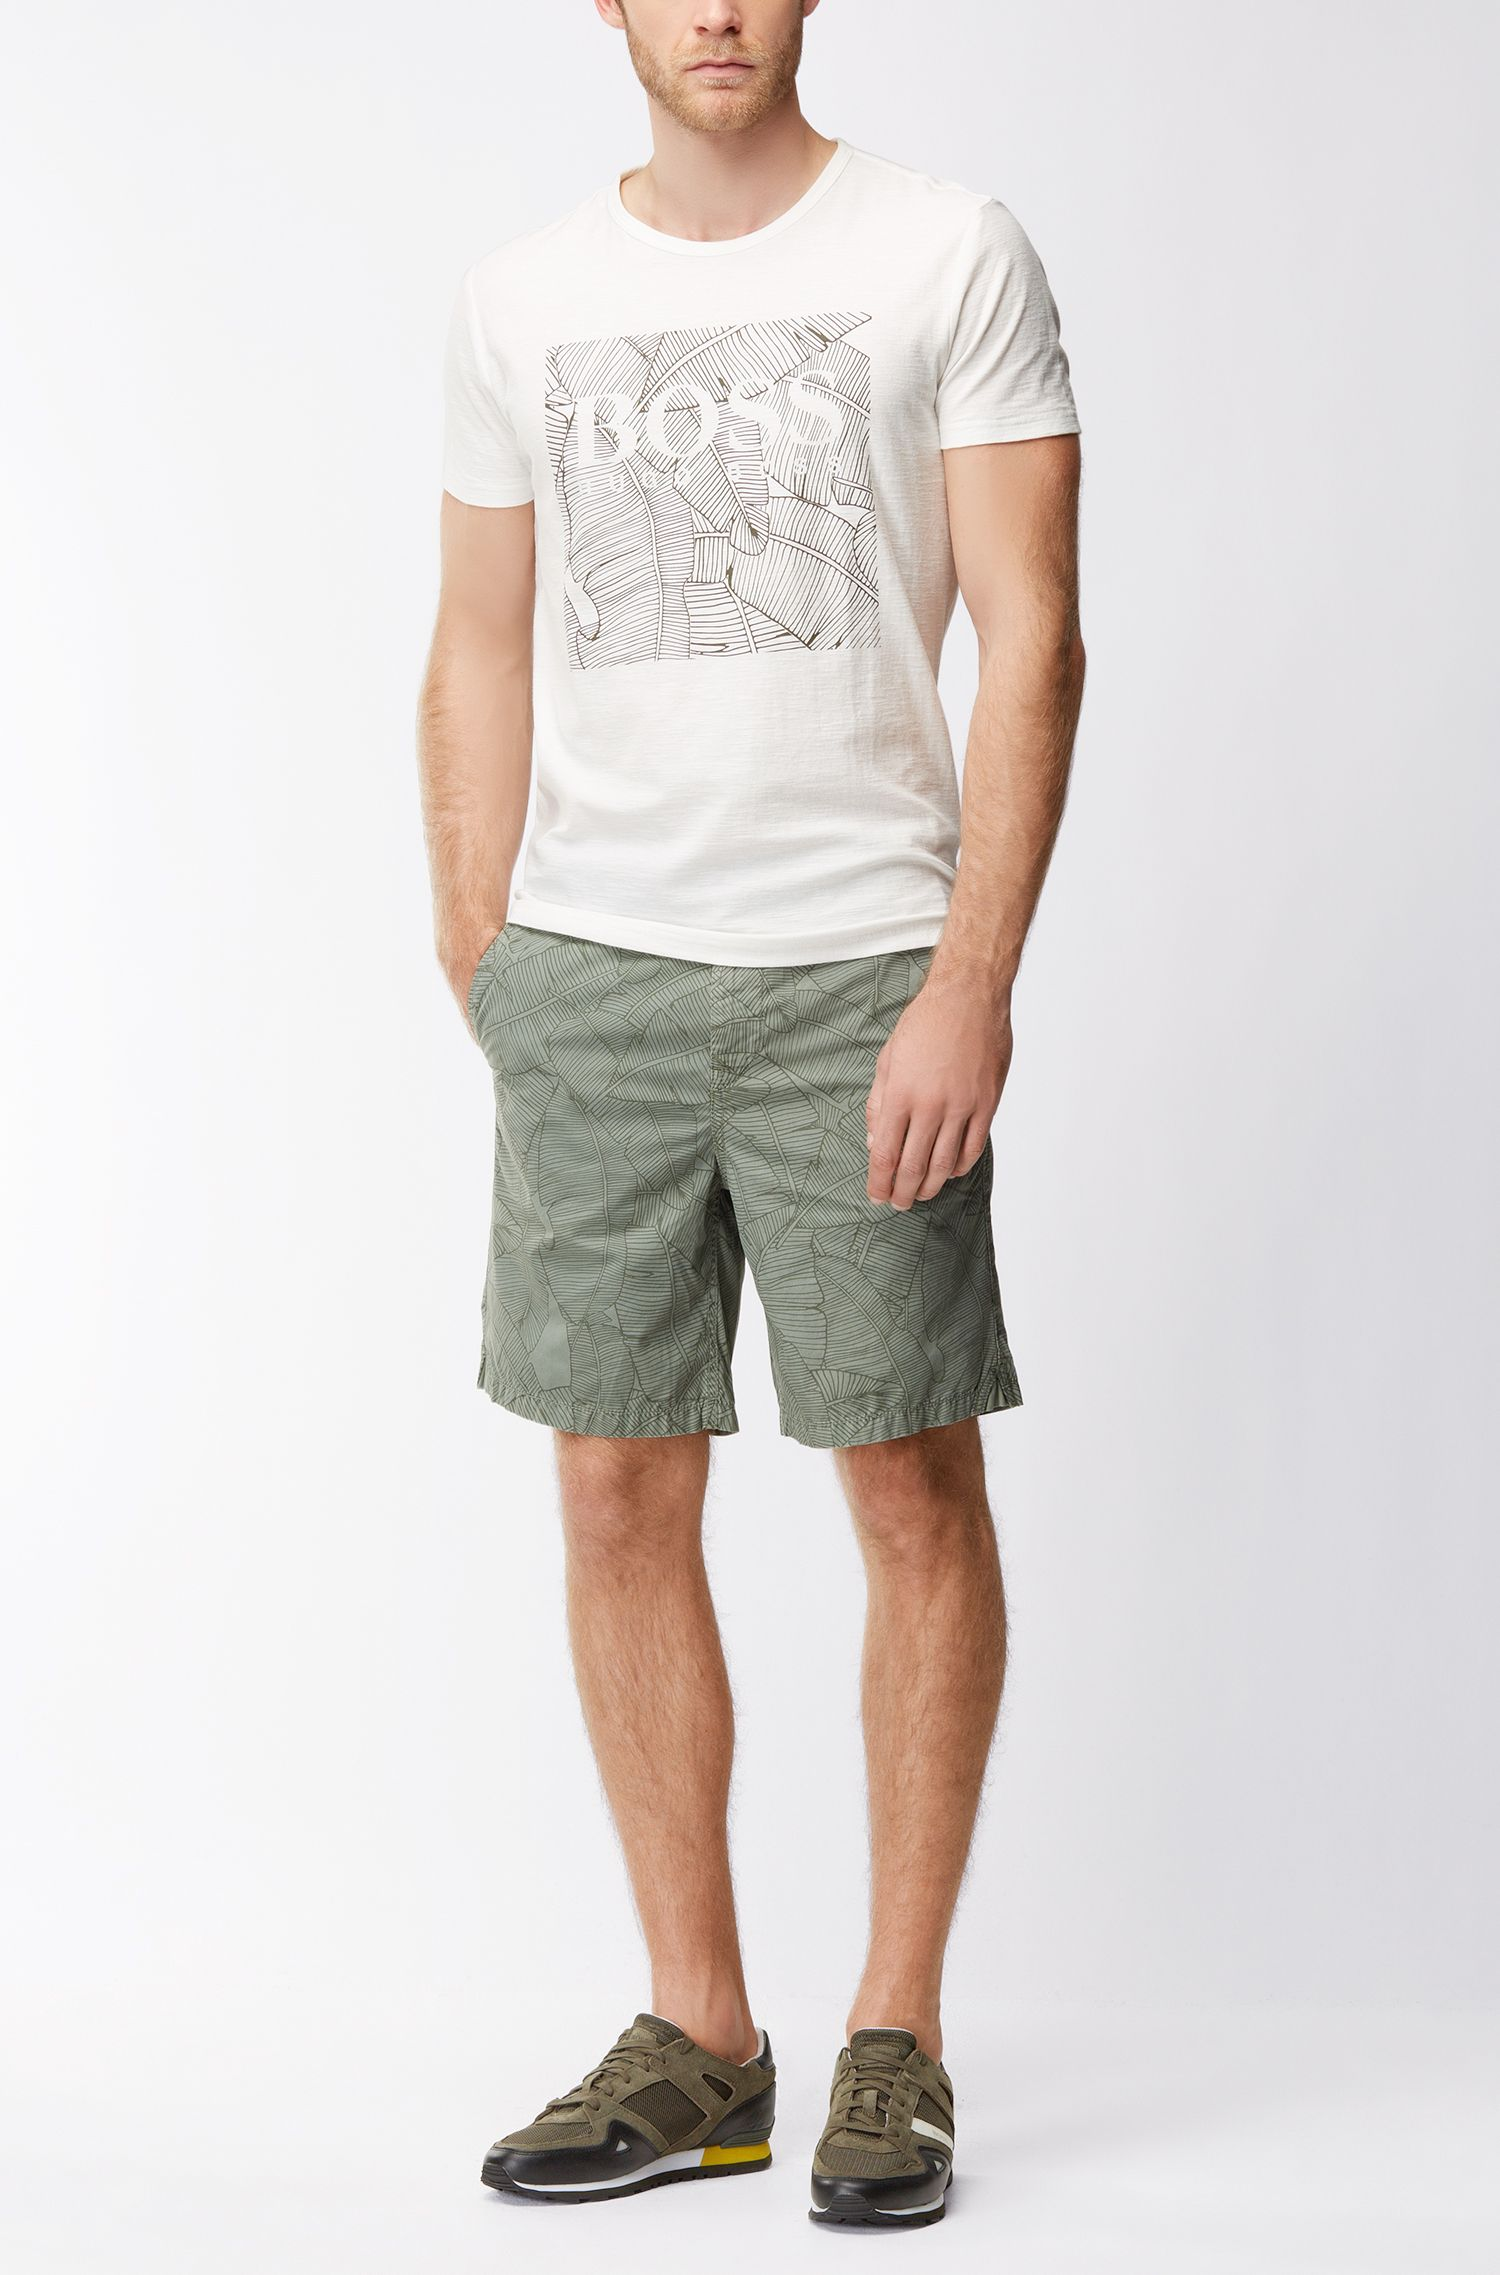 Leaf-Print Cotton Graphic T-Shirt | Tarit, Natural